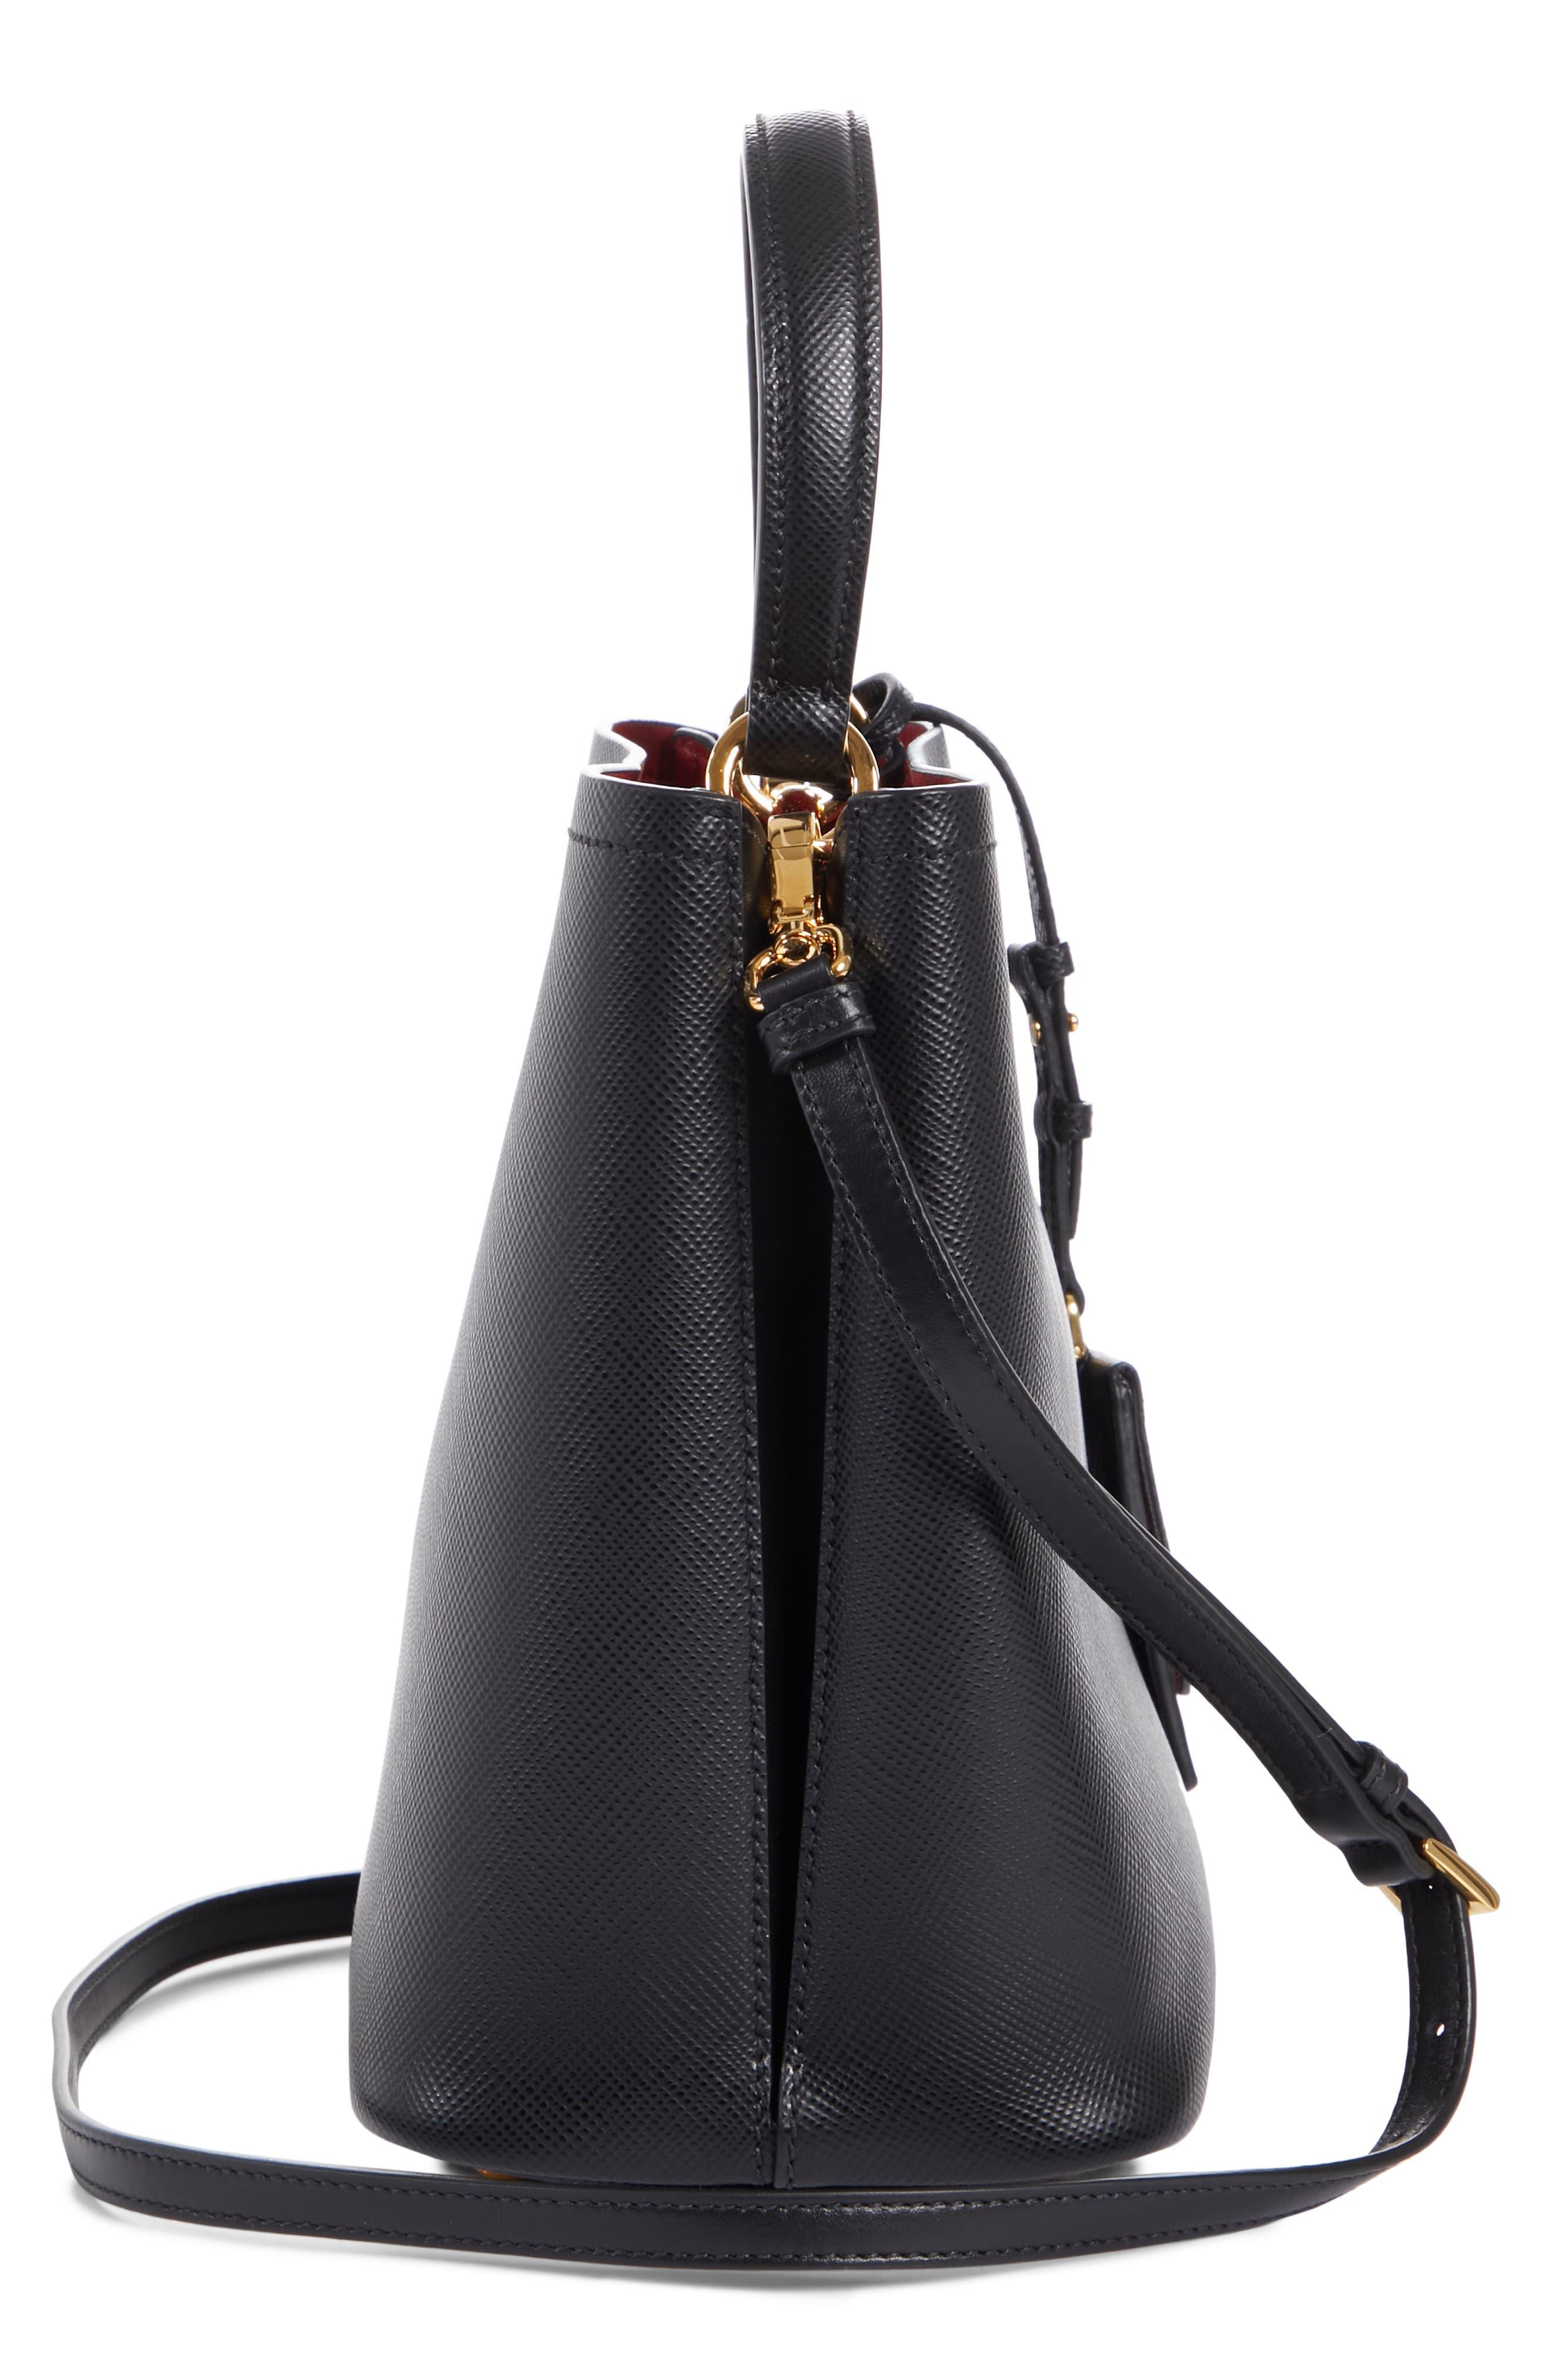 PRADA,                             Double Bucket Bag,                             Alternate thumbnail 6, color,                             NERO/ FUOCO